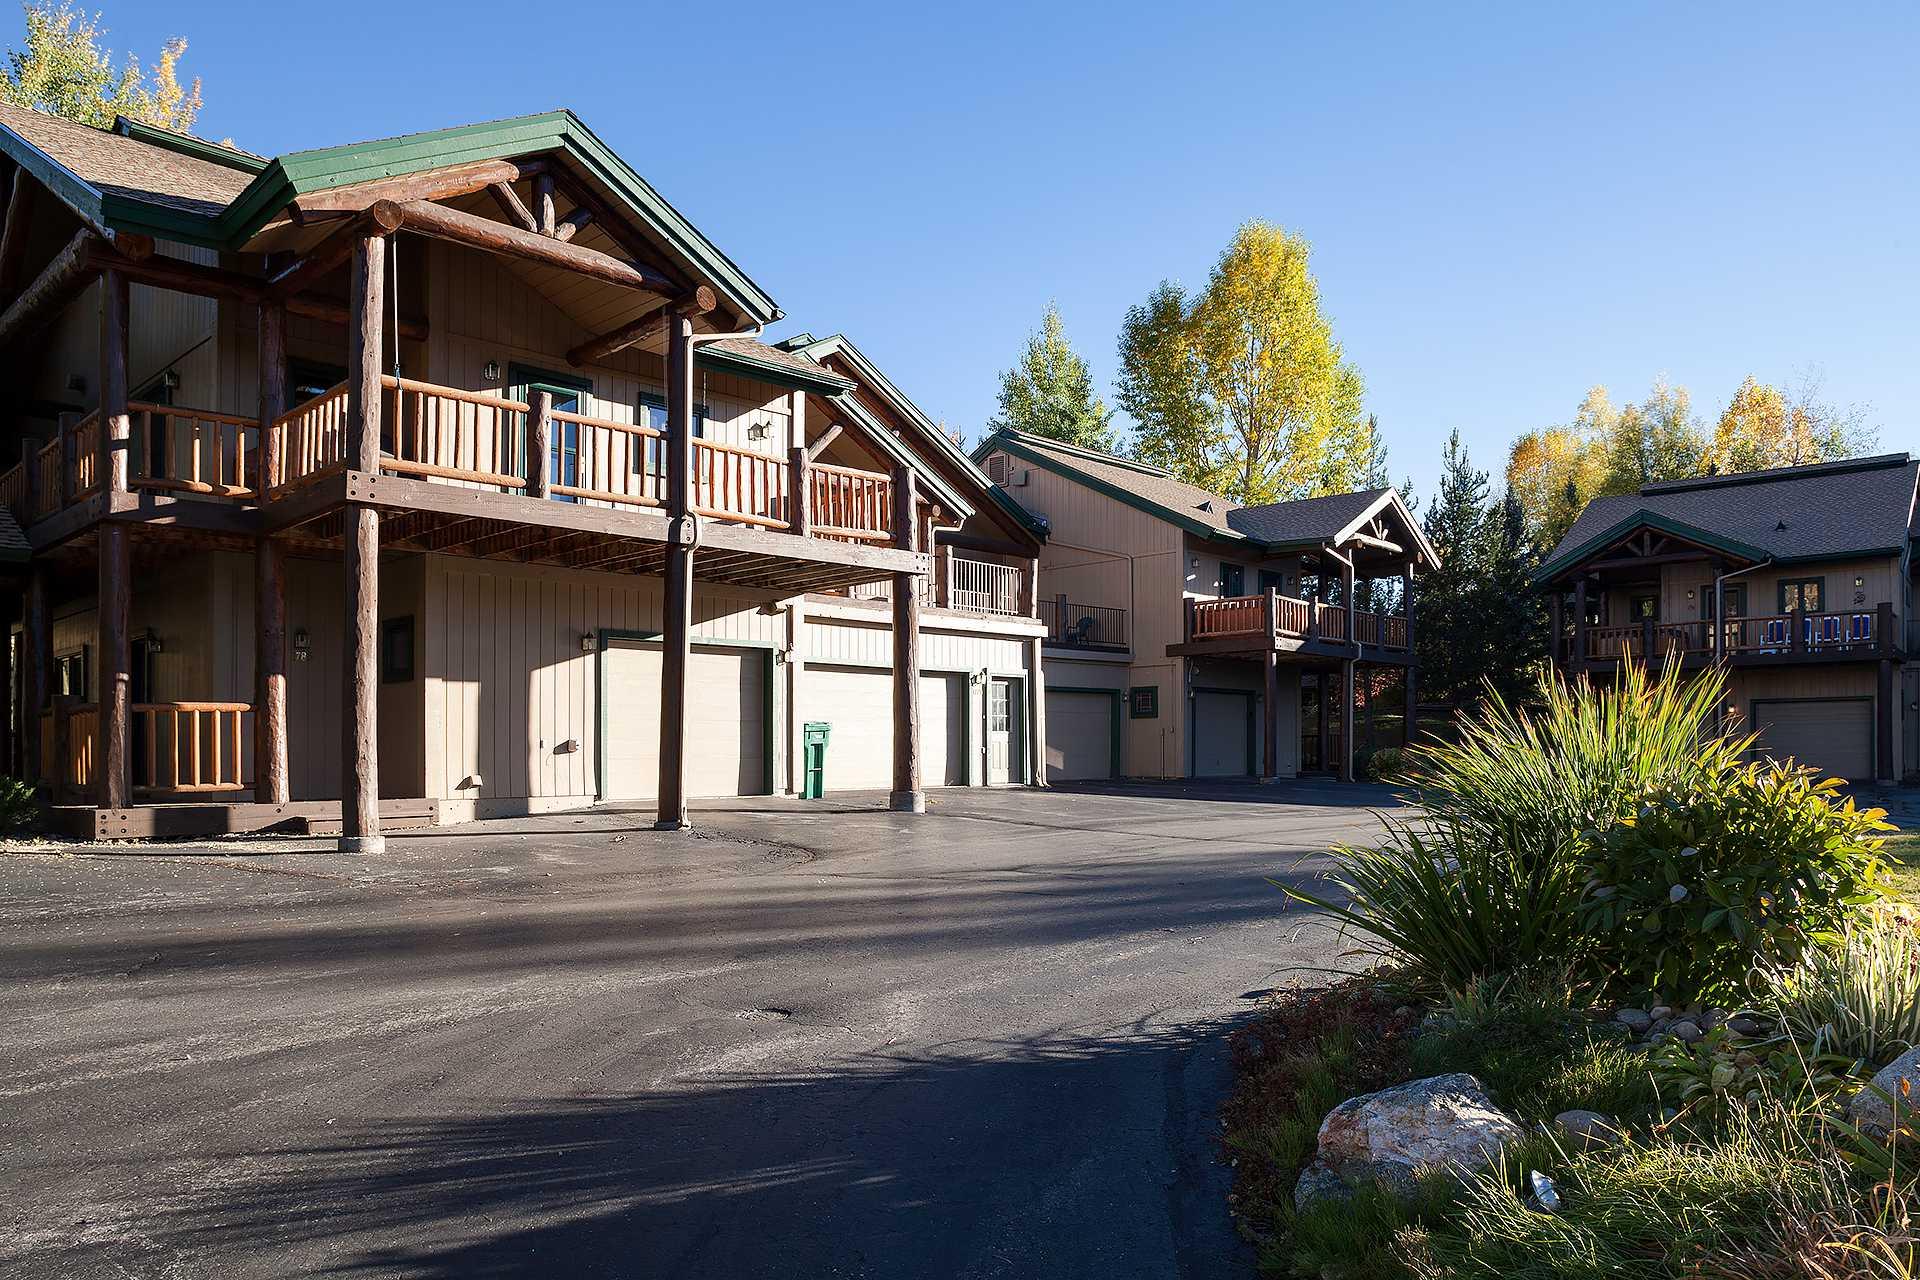 SC715 - Saddle Creek Townhomes